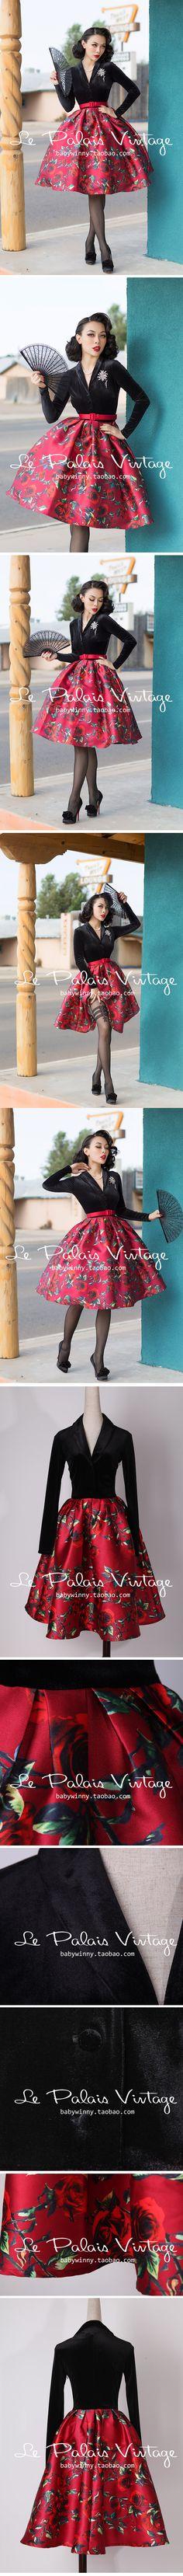 Le Palais Vintage  Vintage style pinup with fan